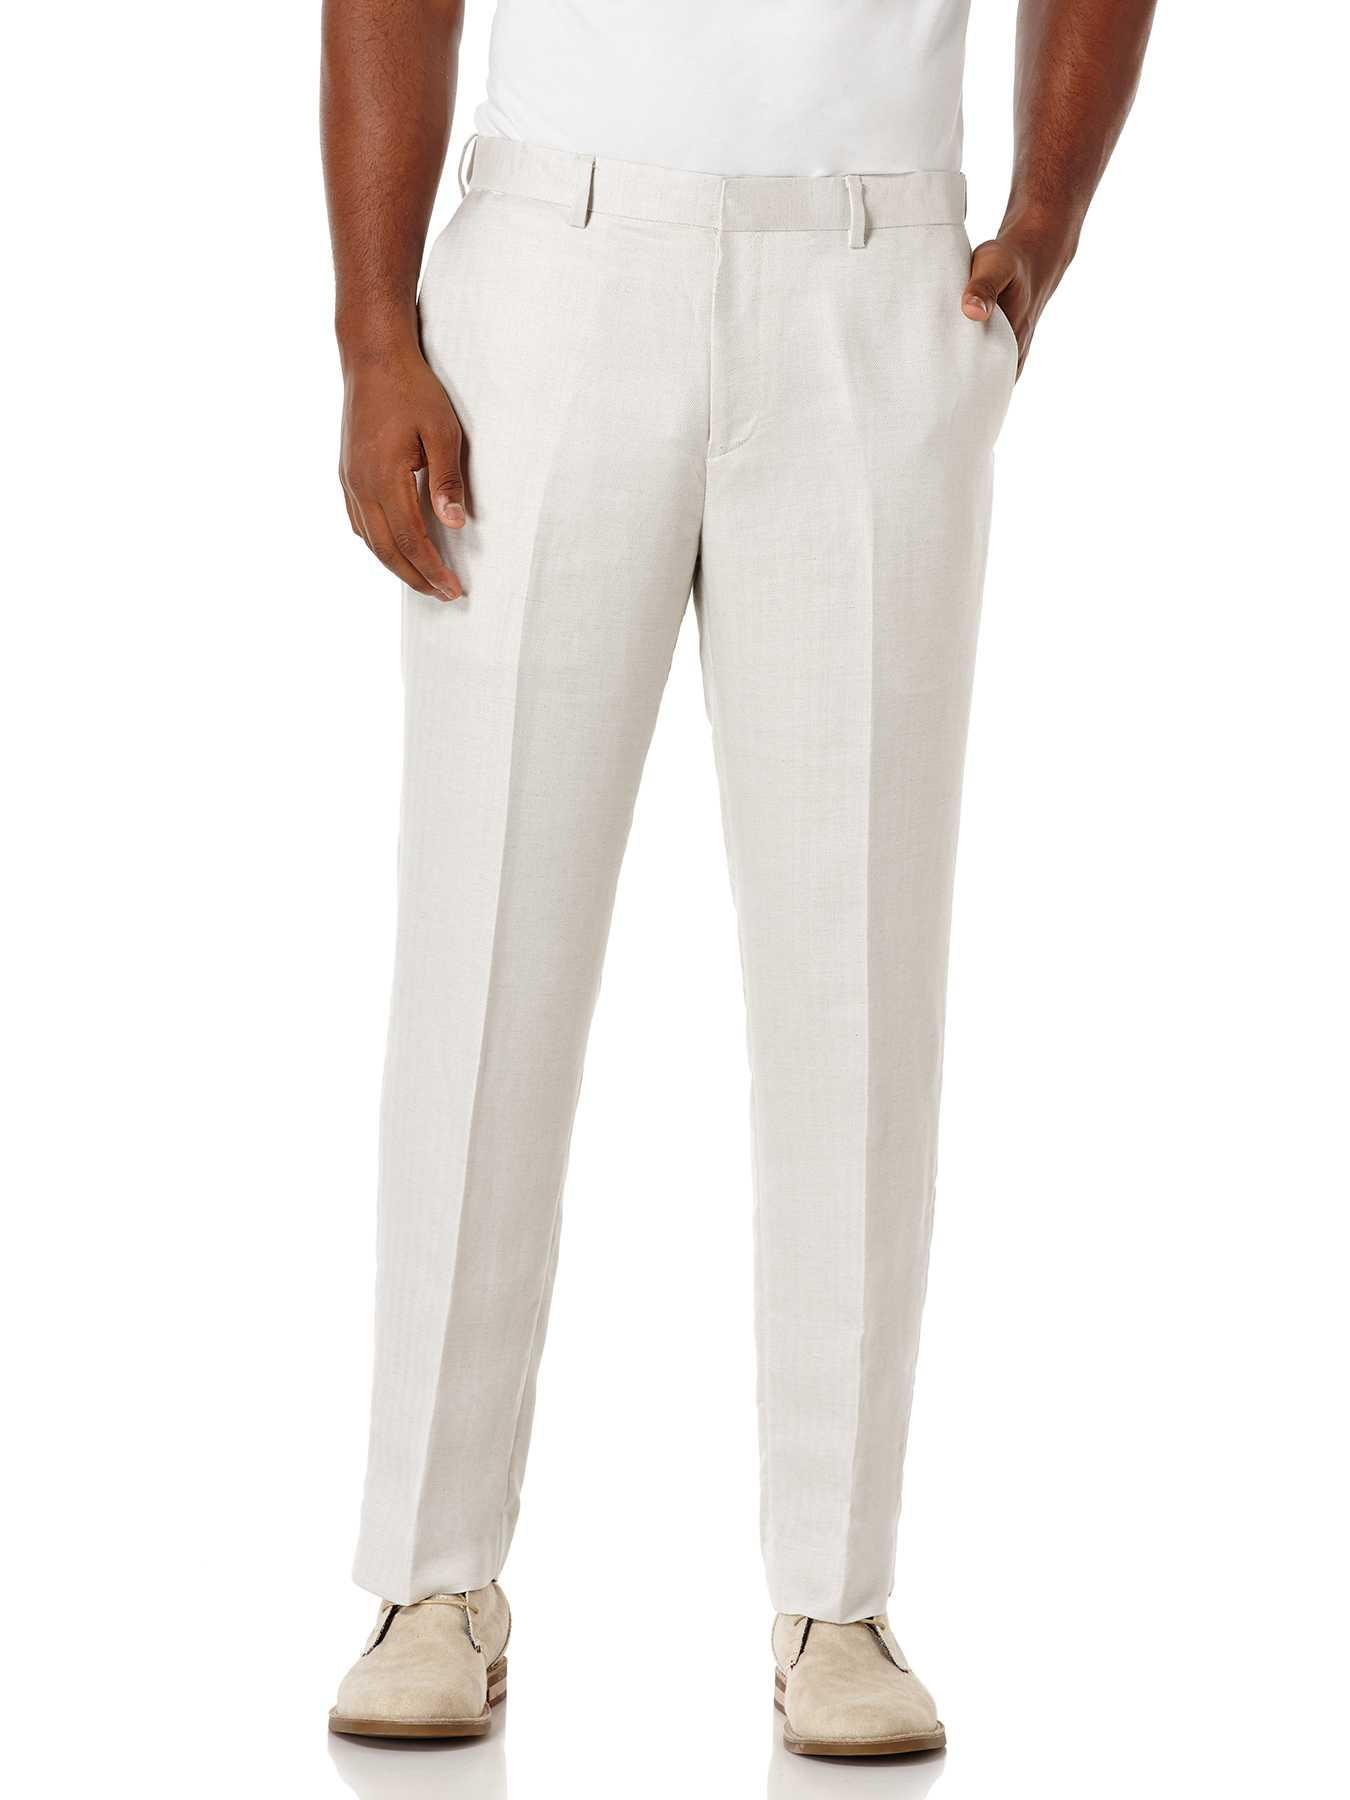 Cubavera Linen Flat Front Herringbone Pant With Motion Waistband